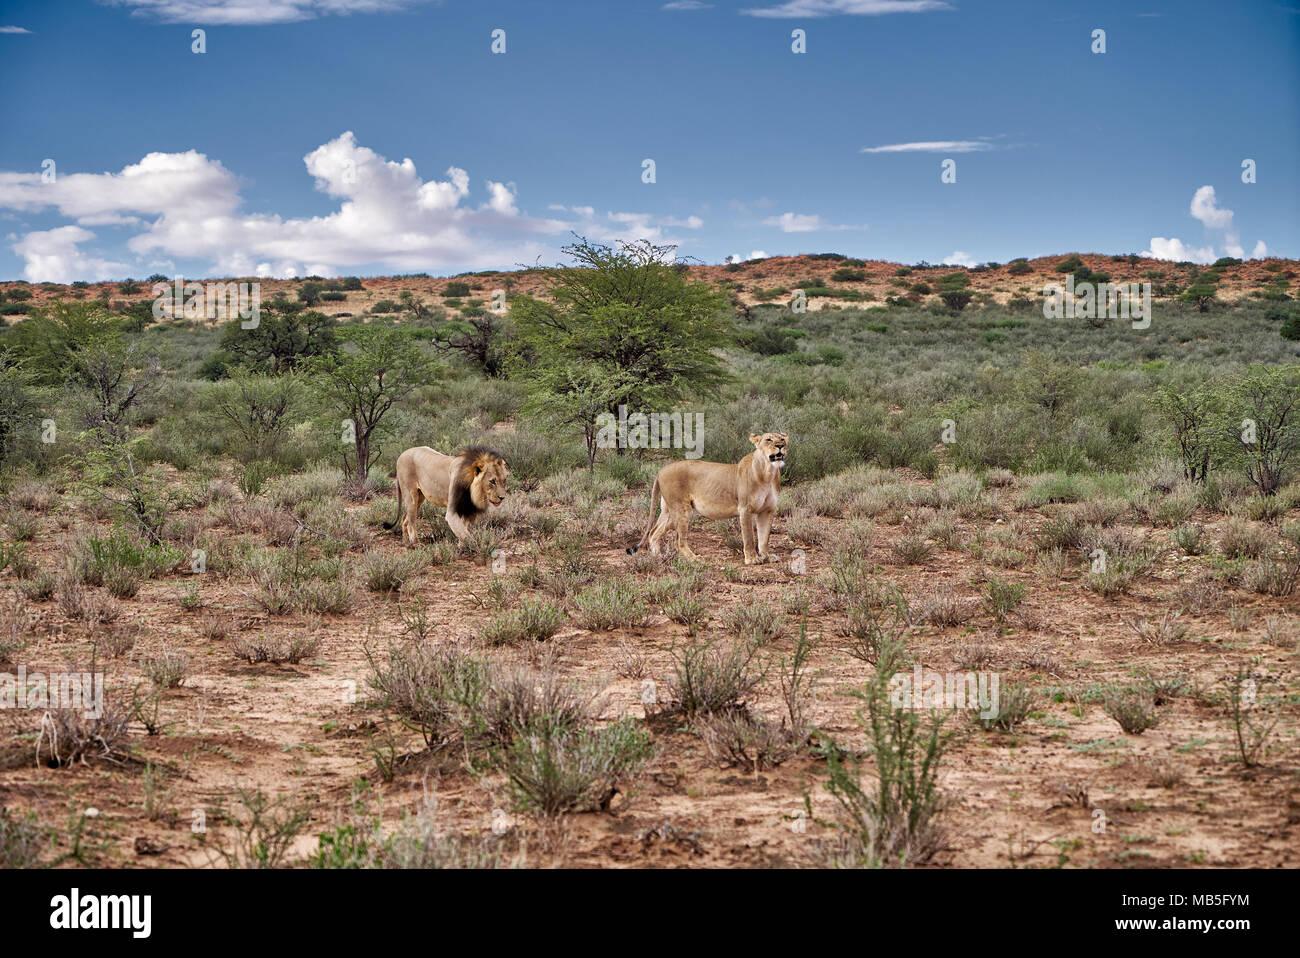 lion couple, Panthera leo, roaming through landscape of the Kalahari,, Kgalagadi Transfrontier Park, South Africa, Africa - Stock Image